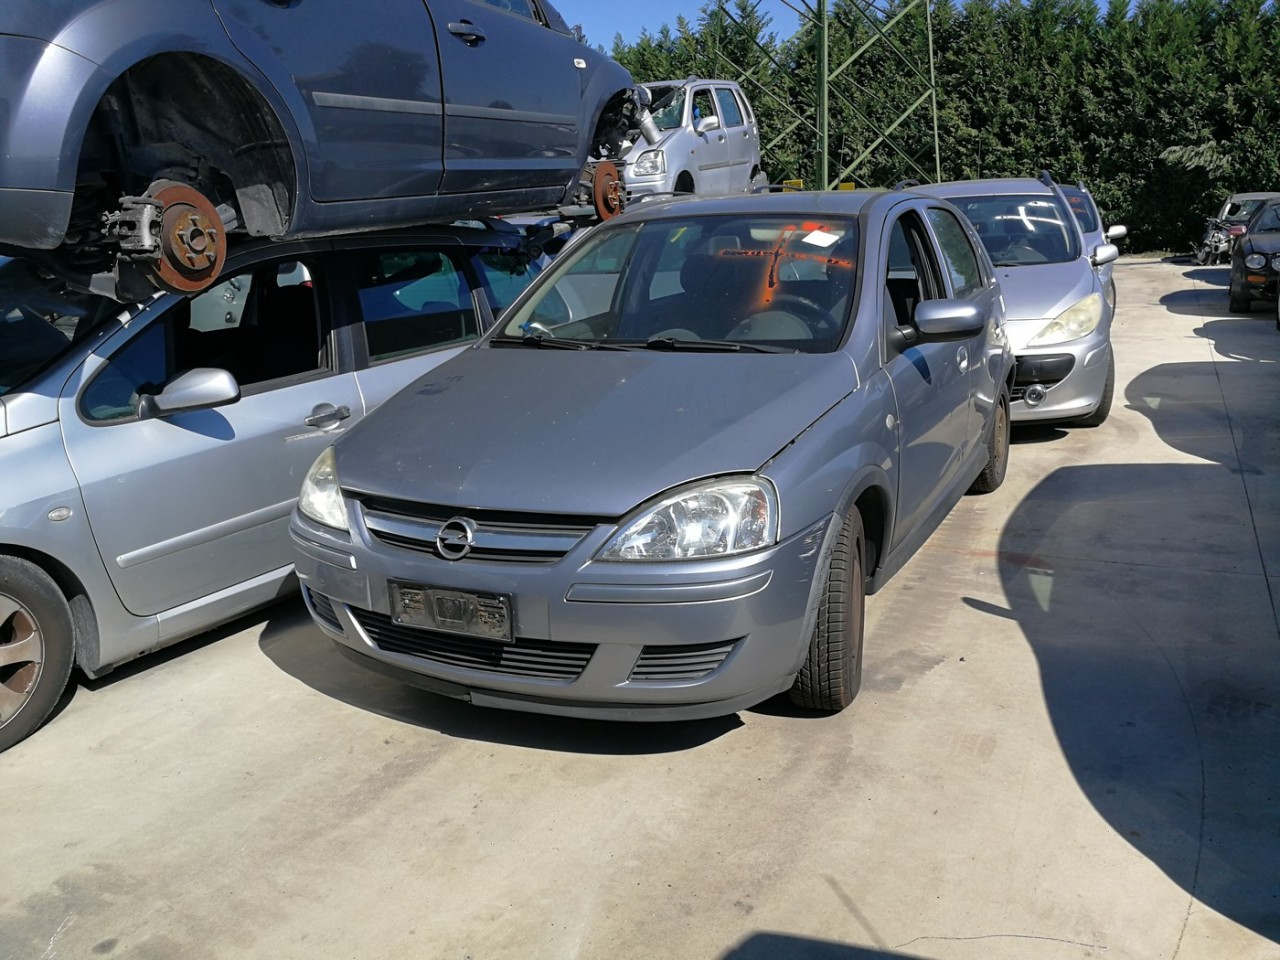 Dezmembrez Opel Corsa C facelift an 2003 tip motor Z12XE